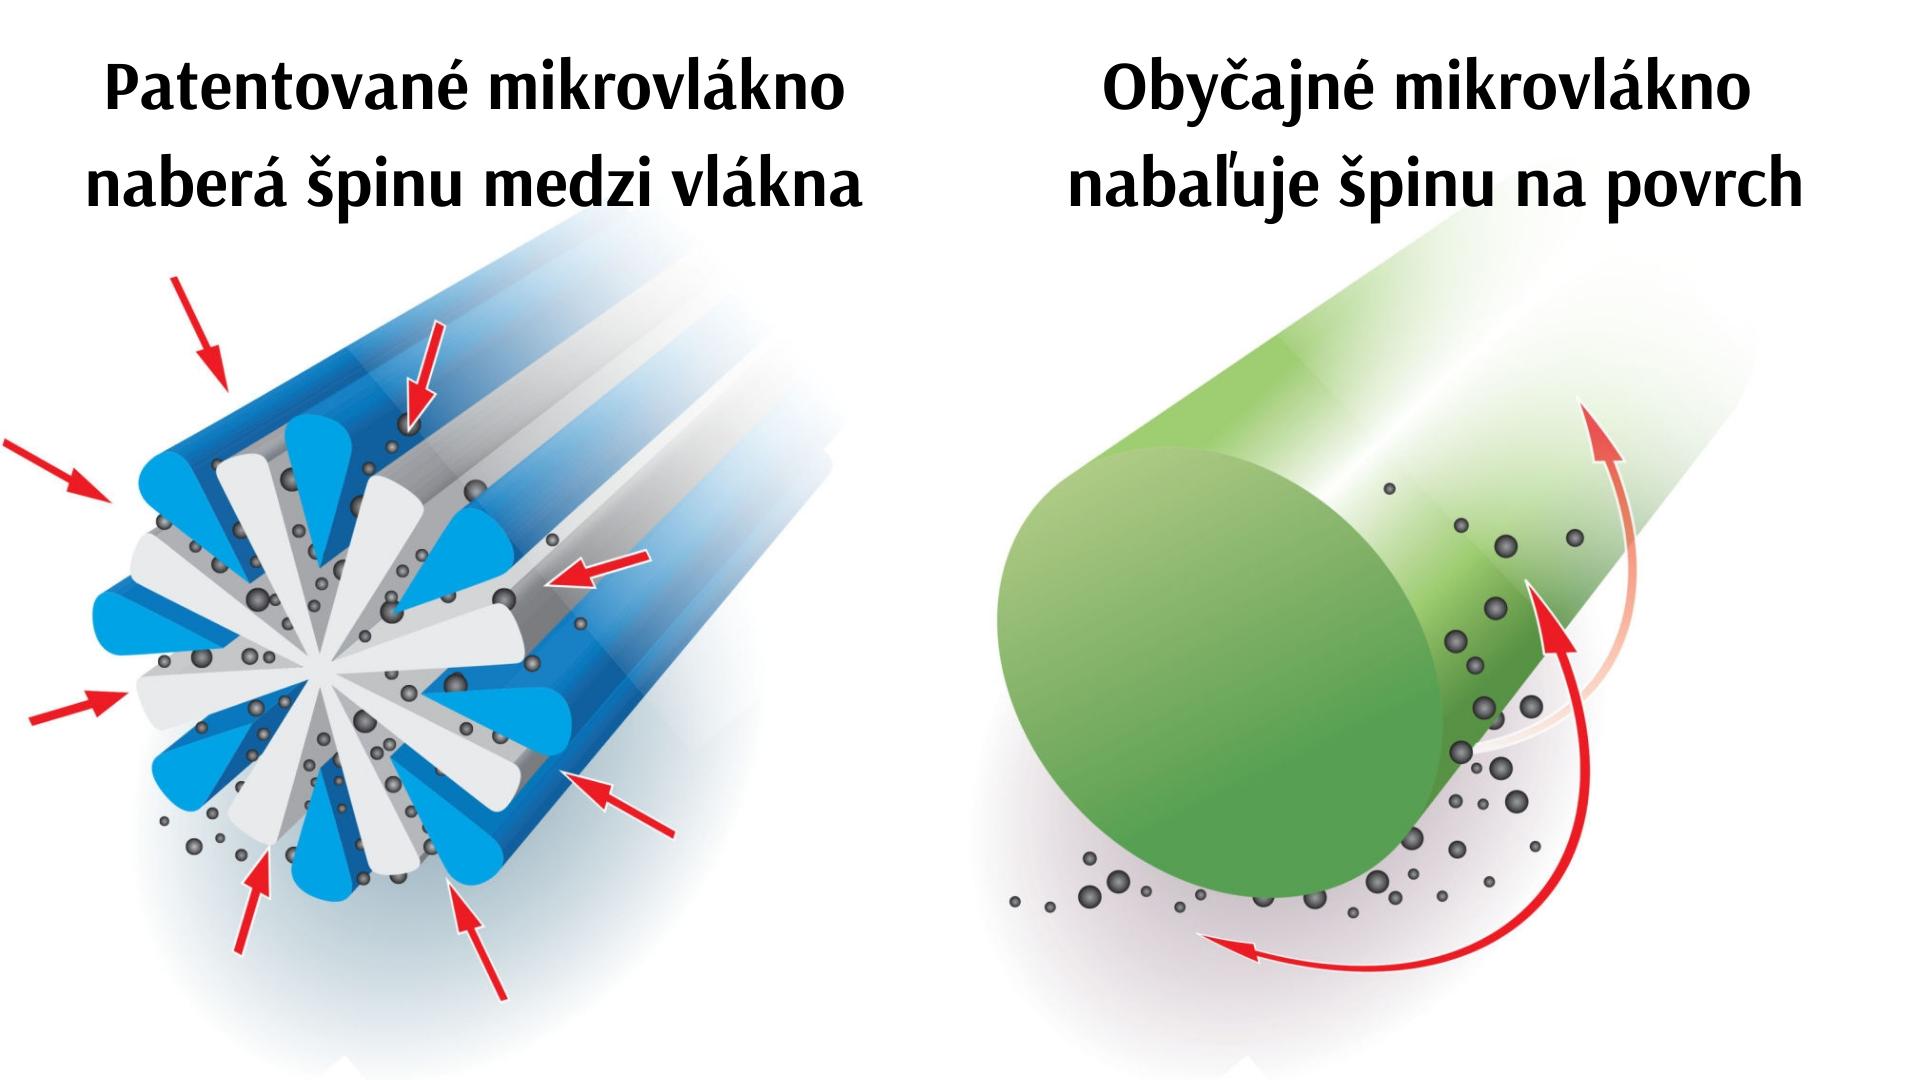 obycajne-mikrovlakno-greenway-vlakno